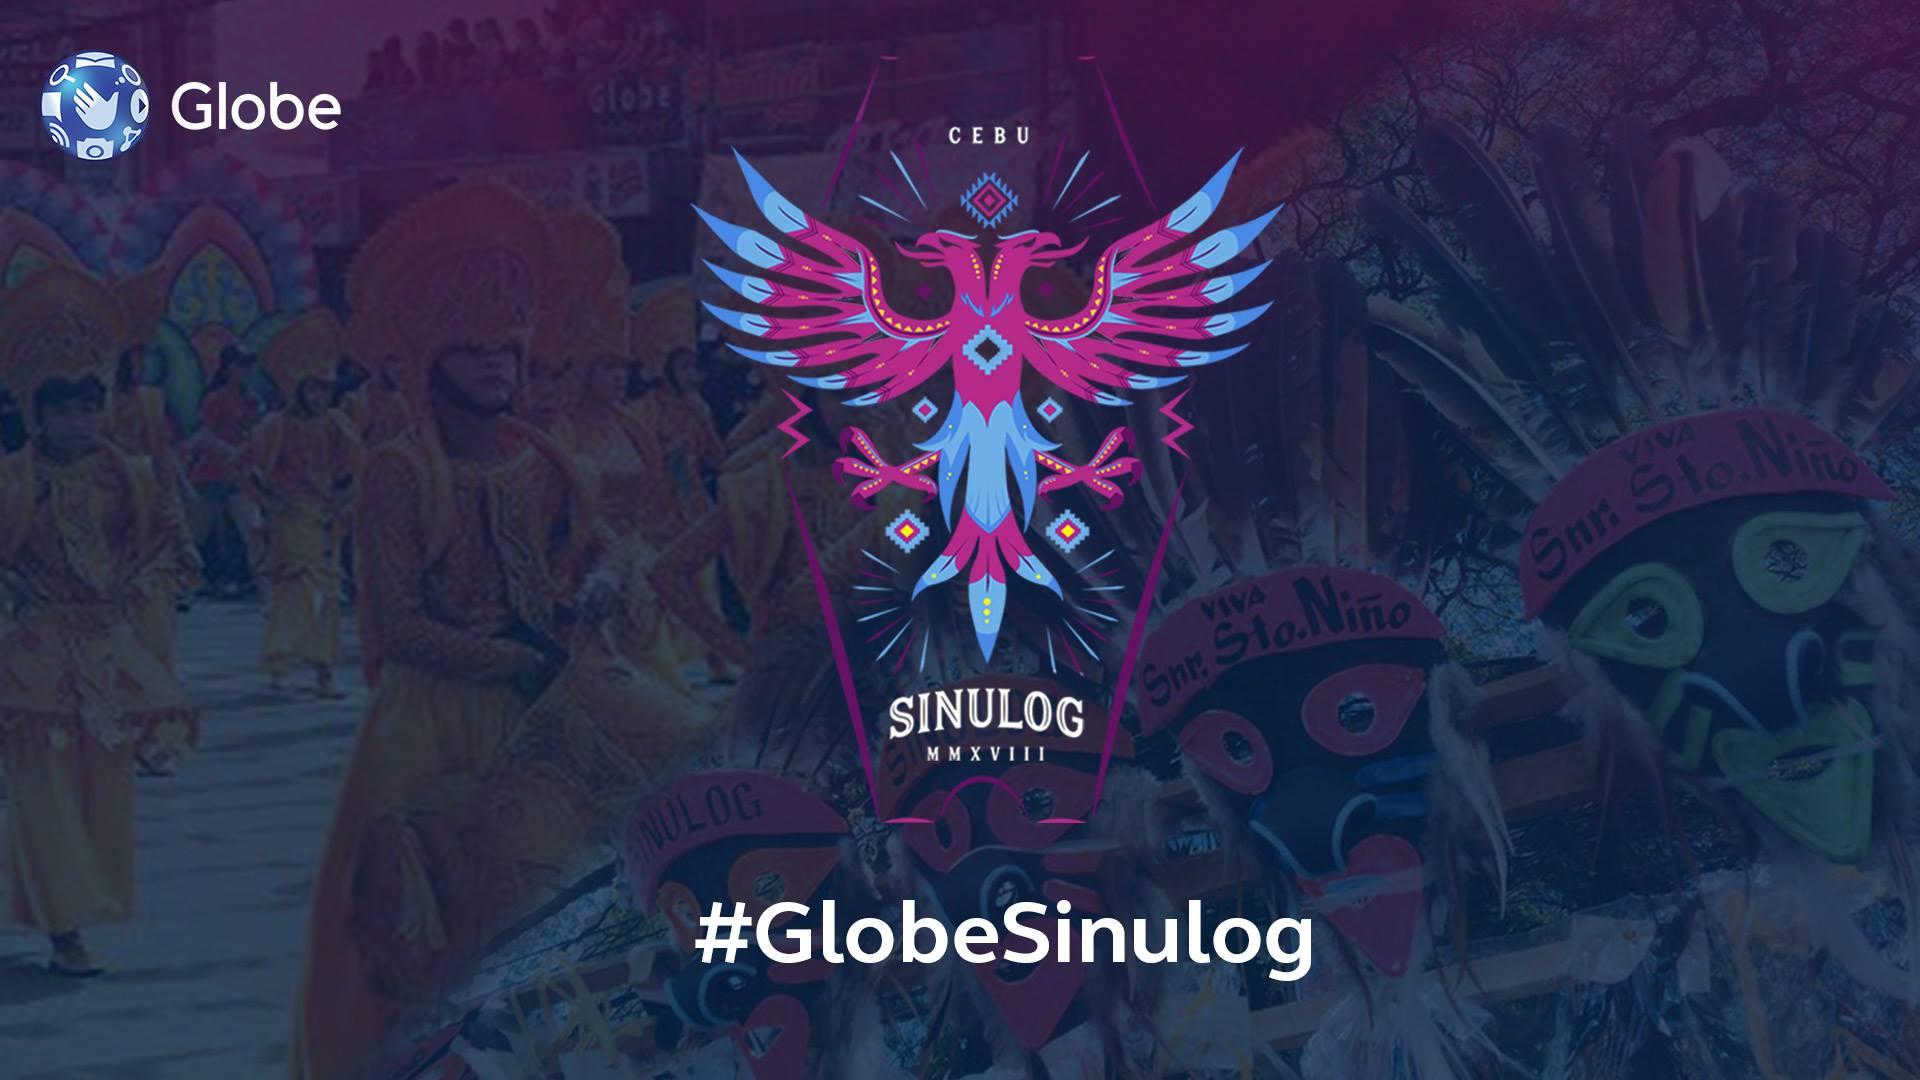 #GlobeSinulog